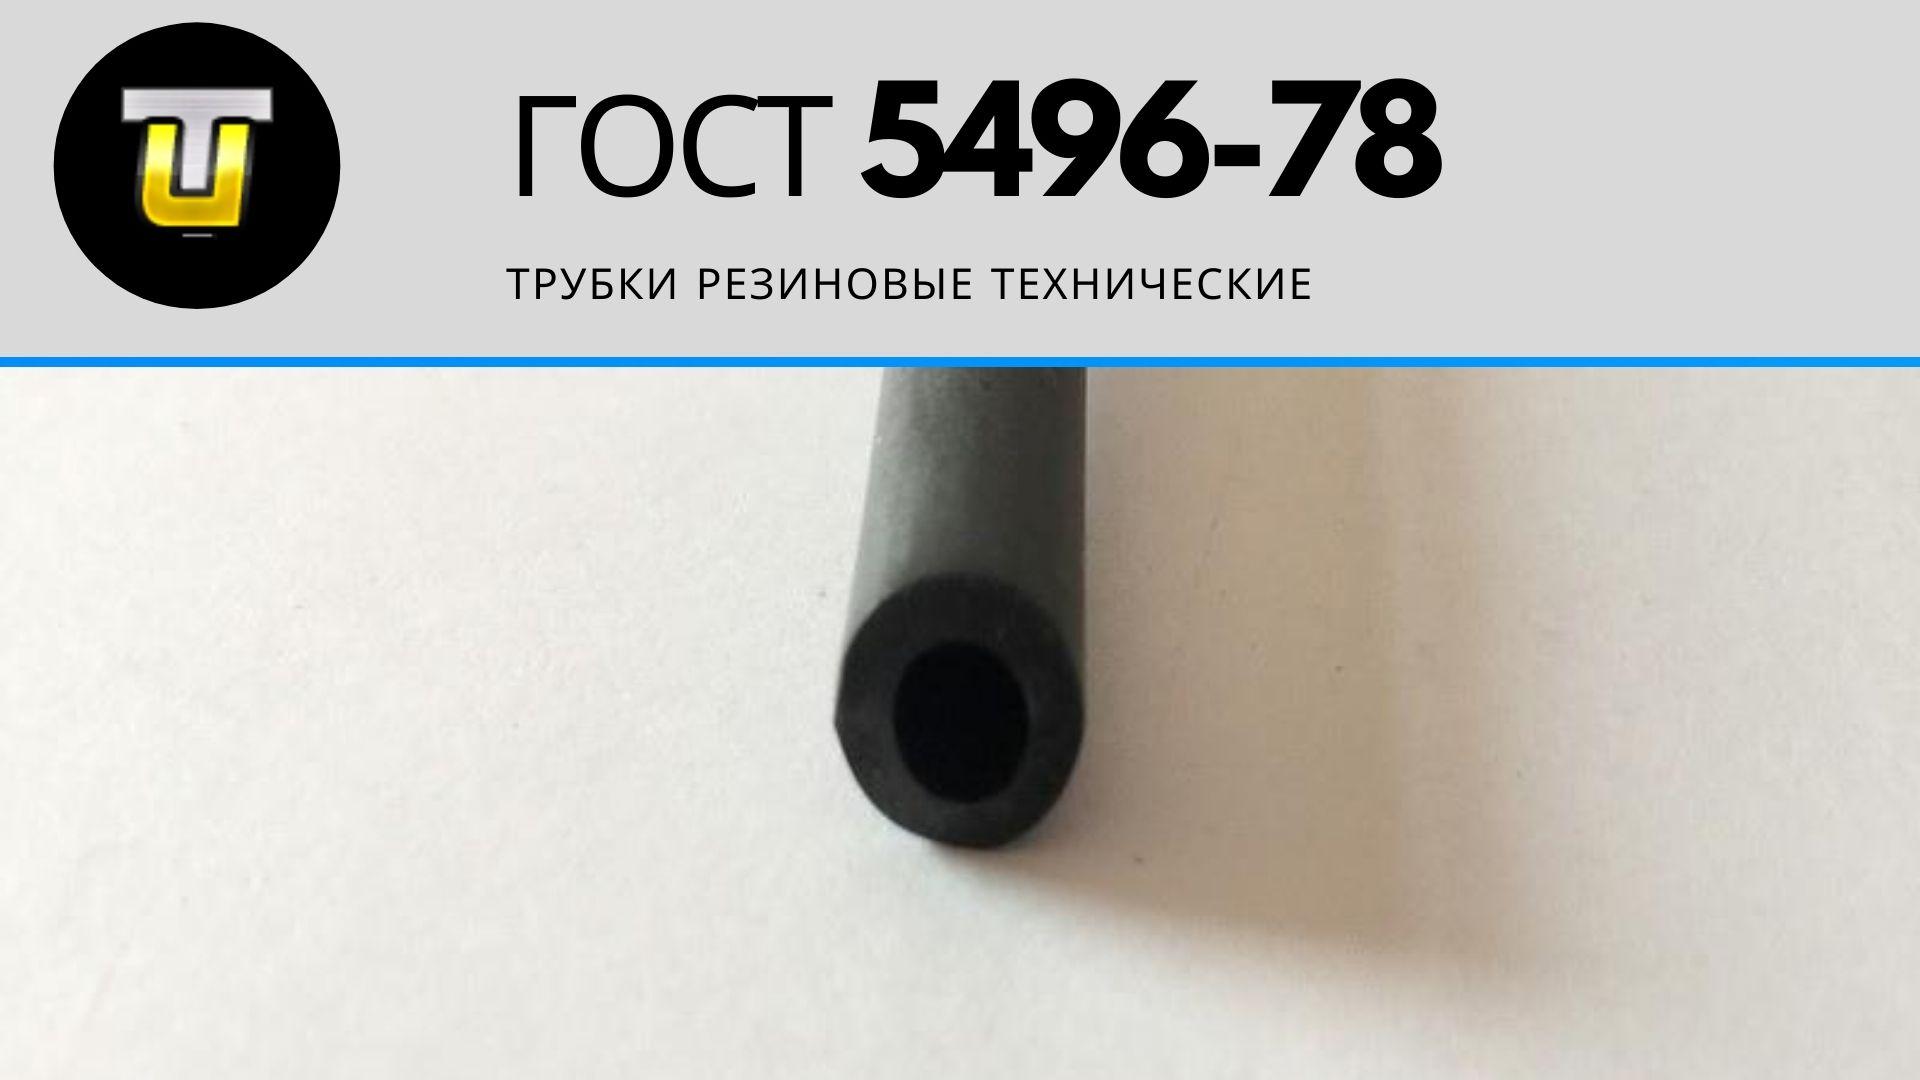 ГОСТ 5496-78